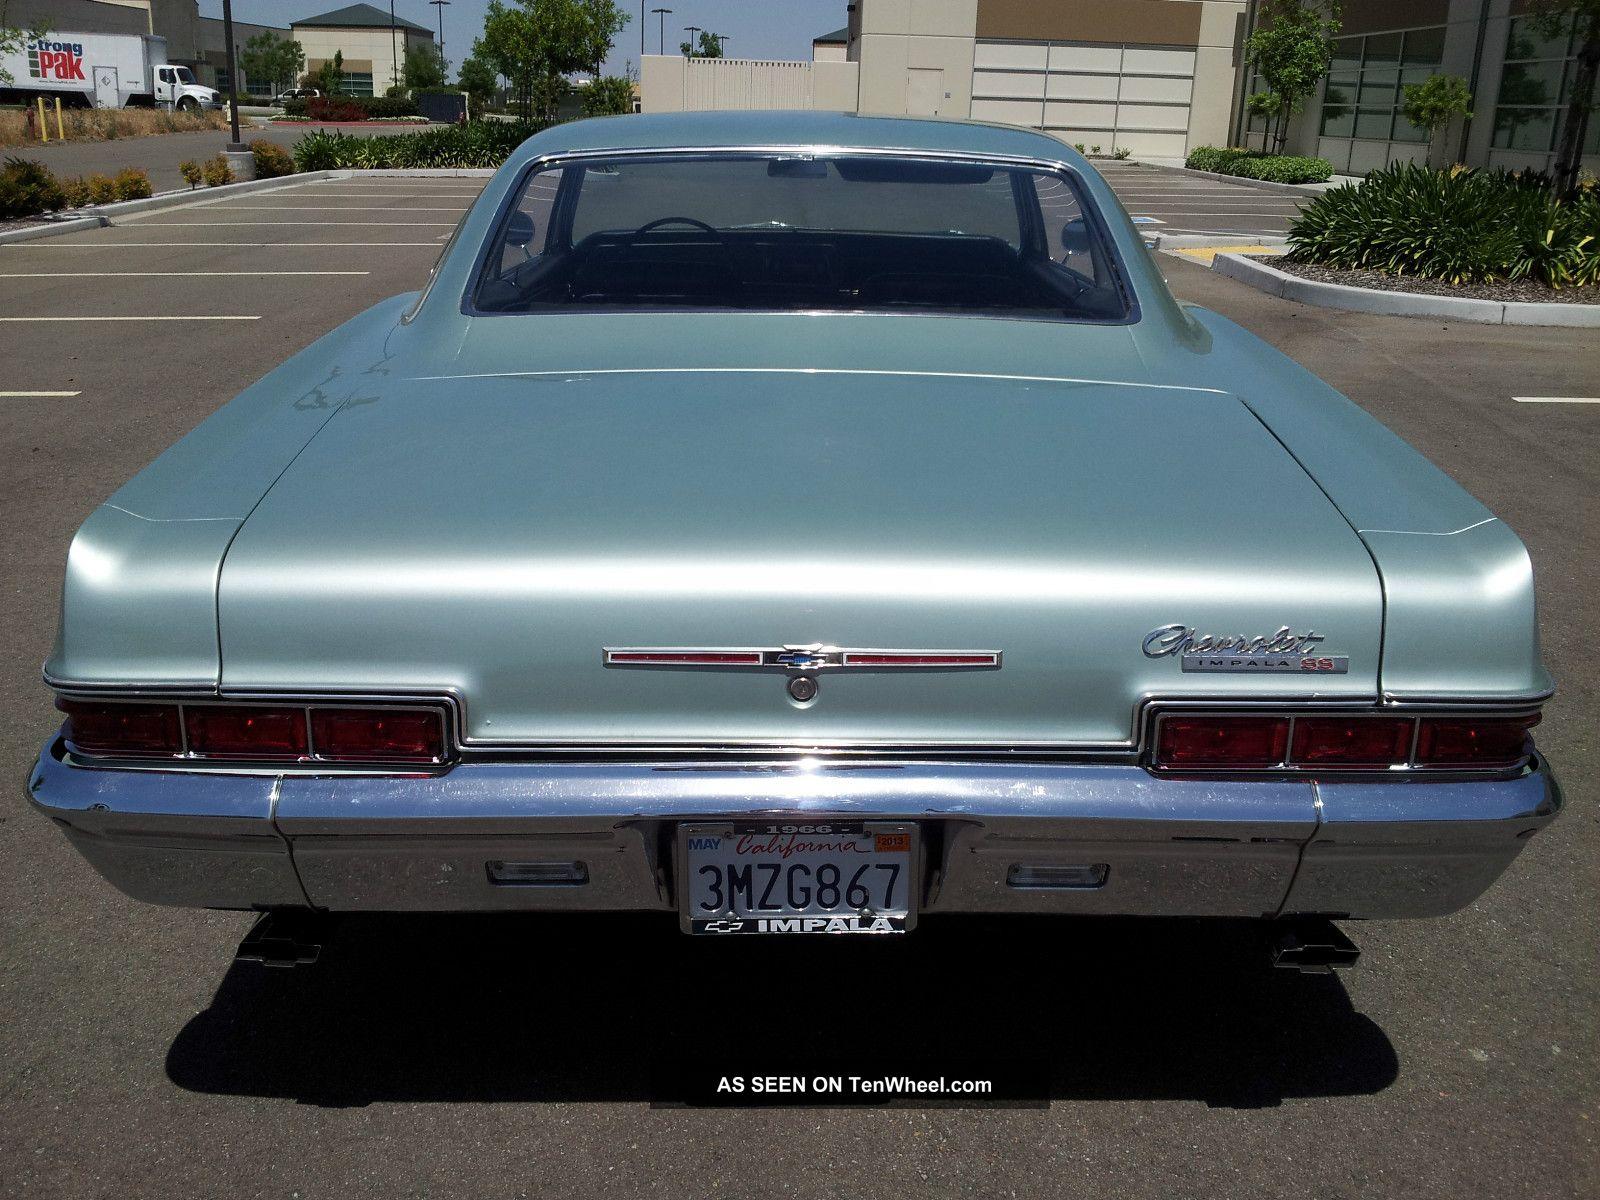 1966 Chevy Impala Ss Rare 2 Owner, Garage Find, Impala photo 10